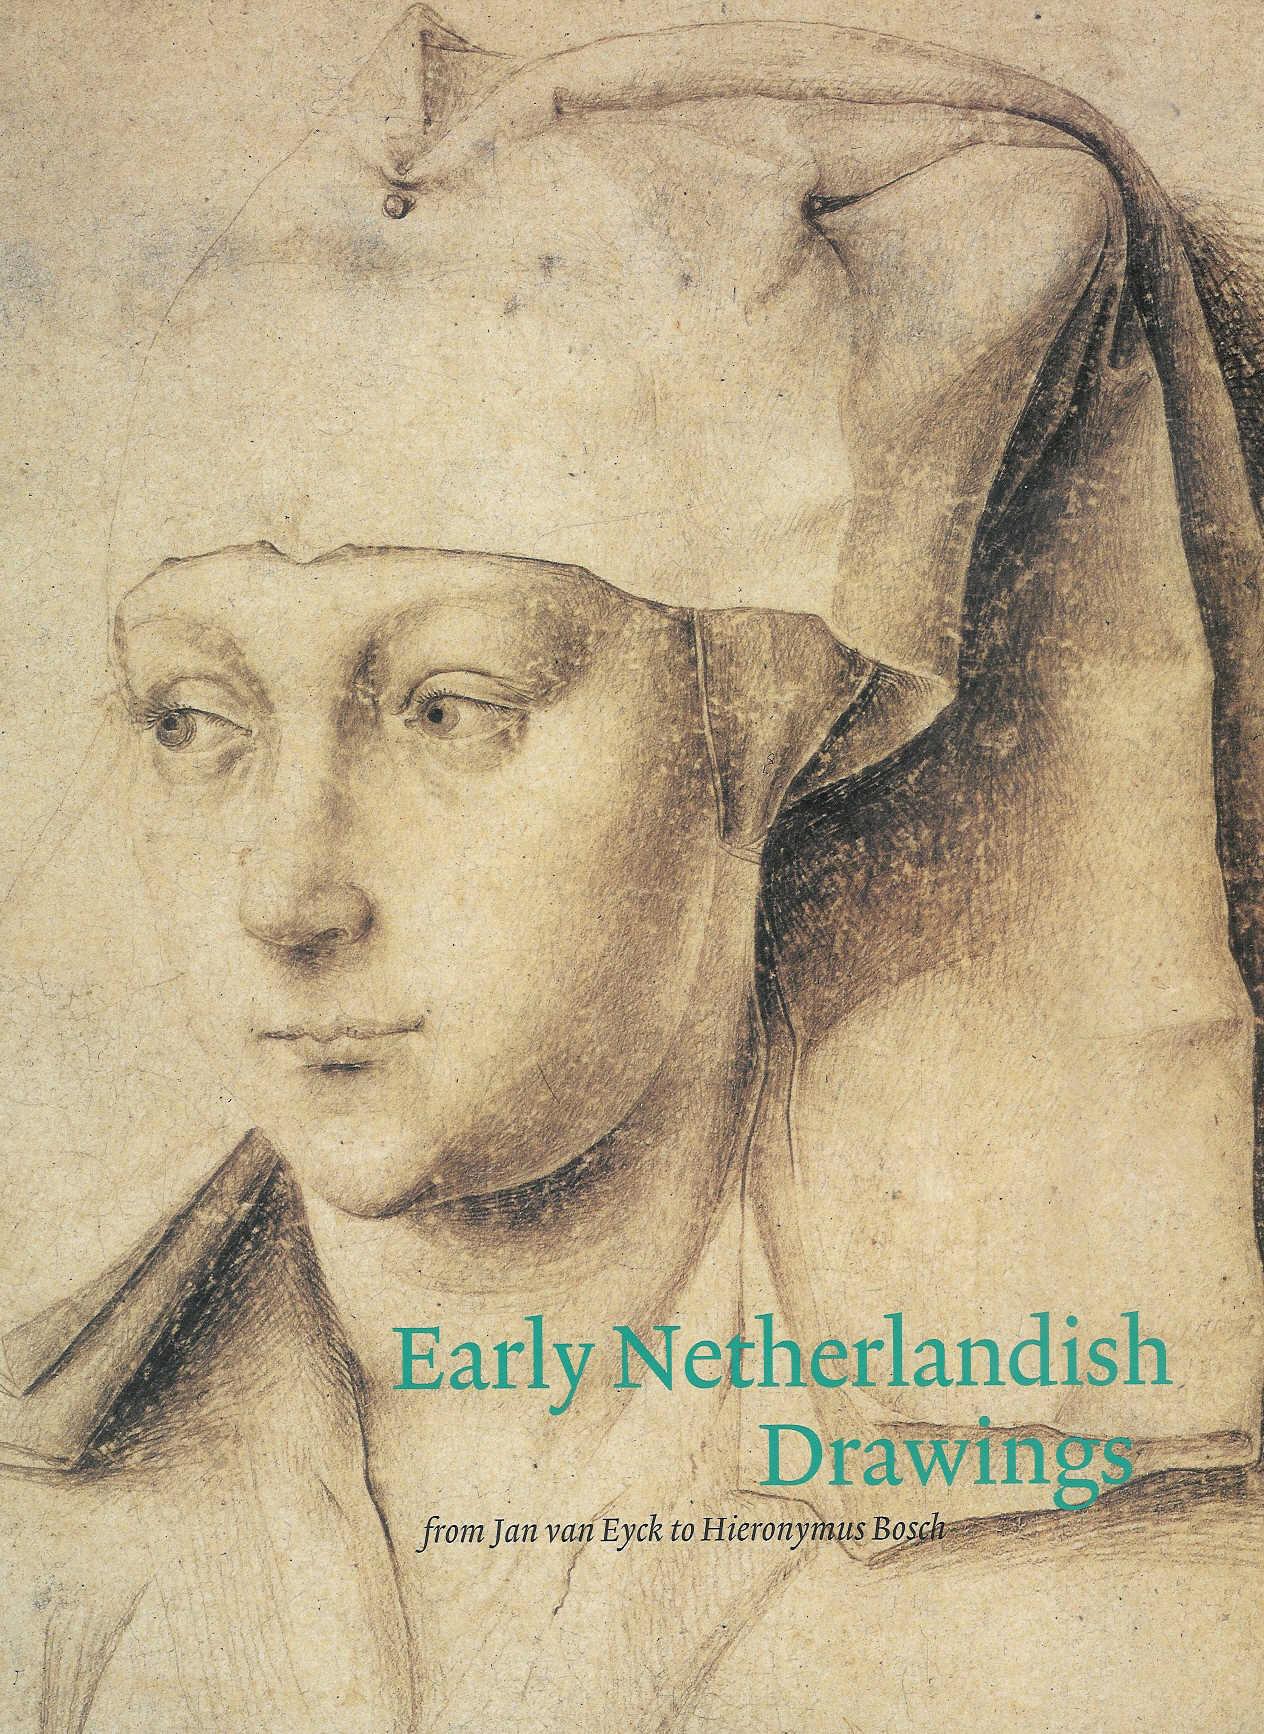 Cat. Early Netherlandish drawings, Rubenshuis 2002